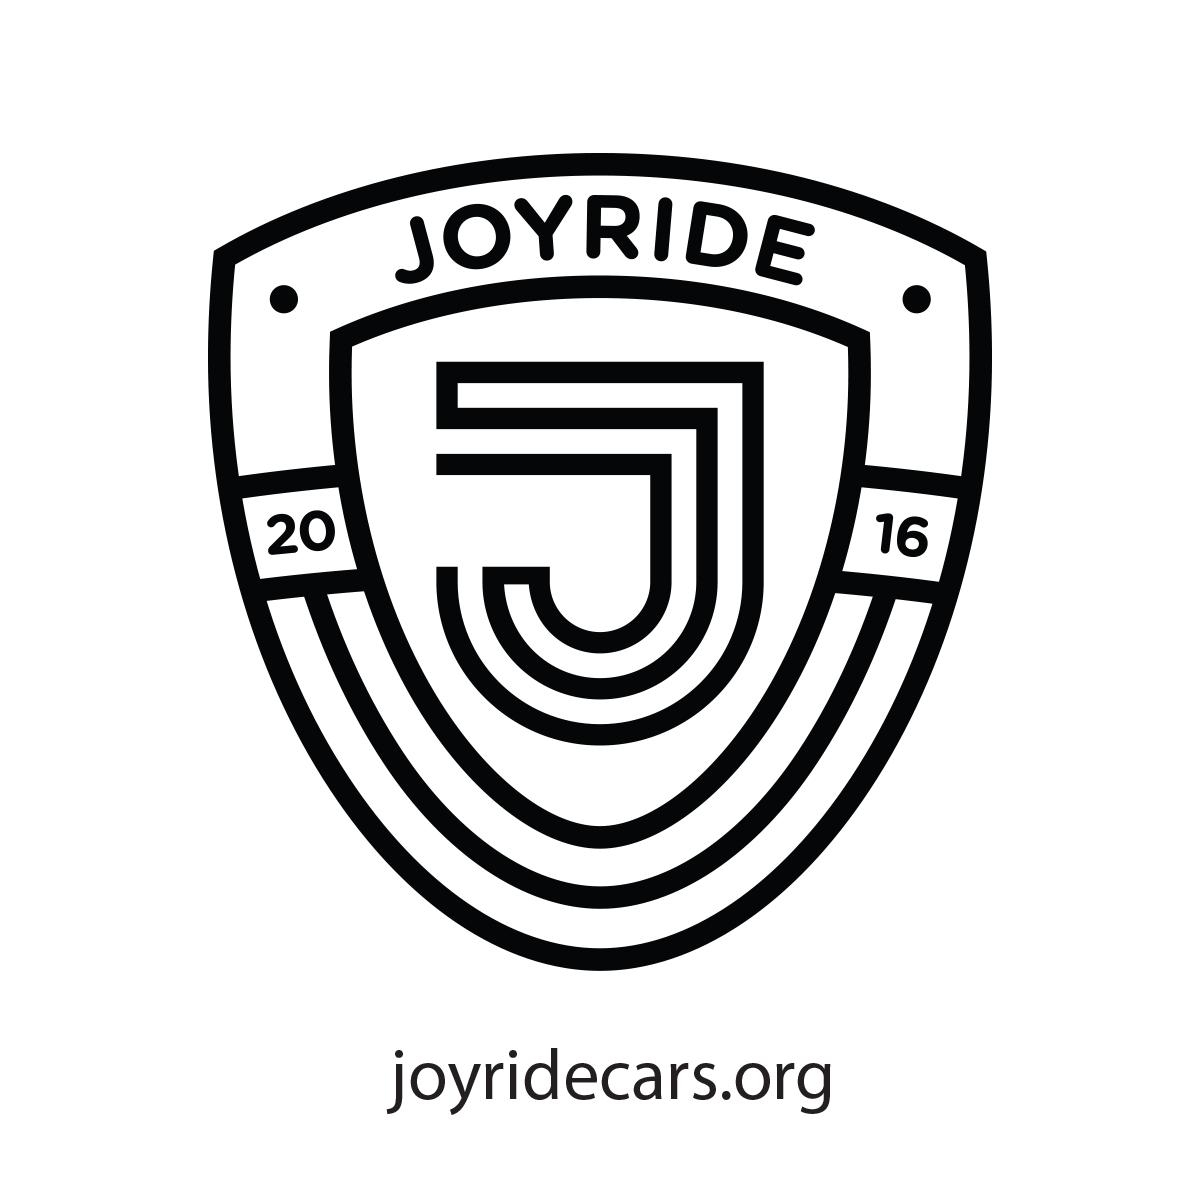 Dayton Cars And Coffee